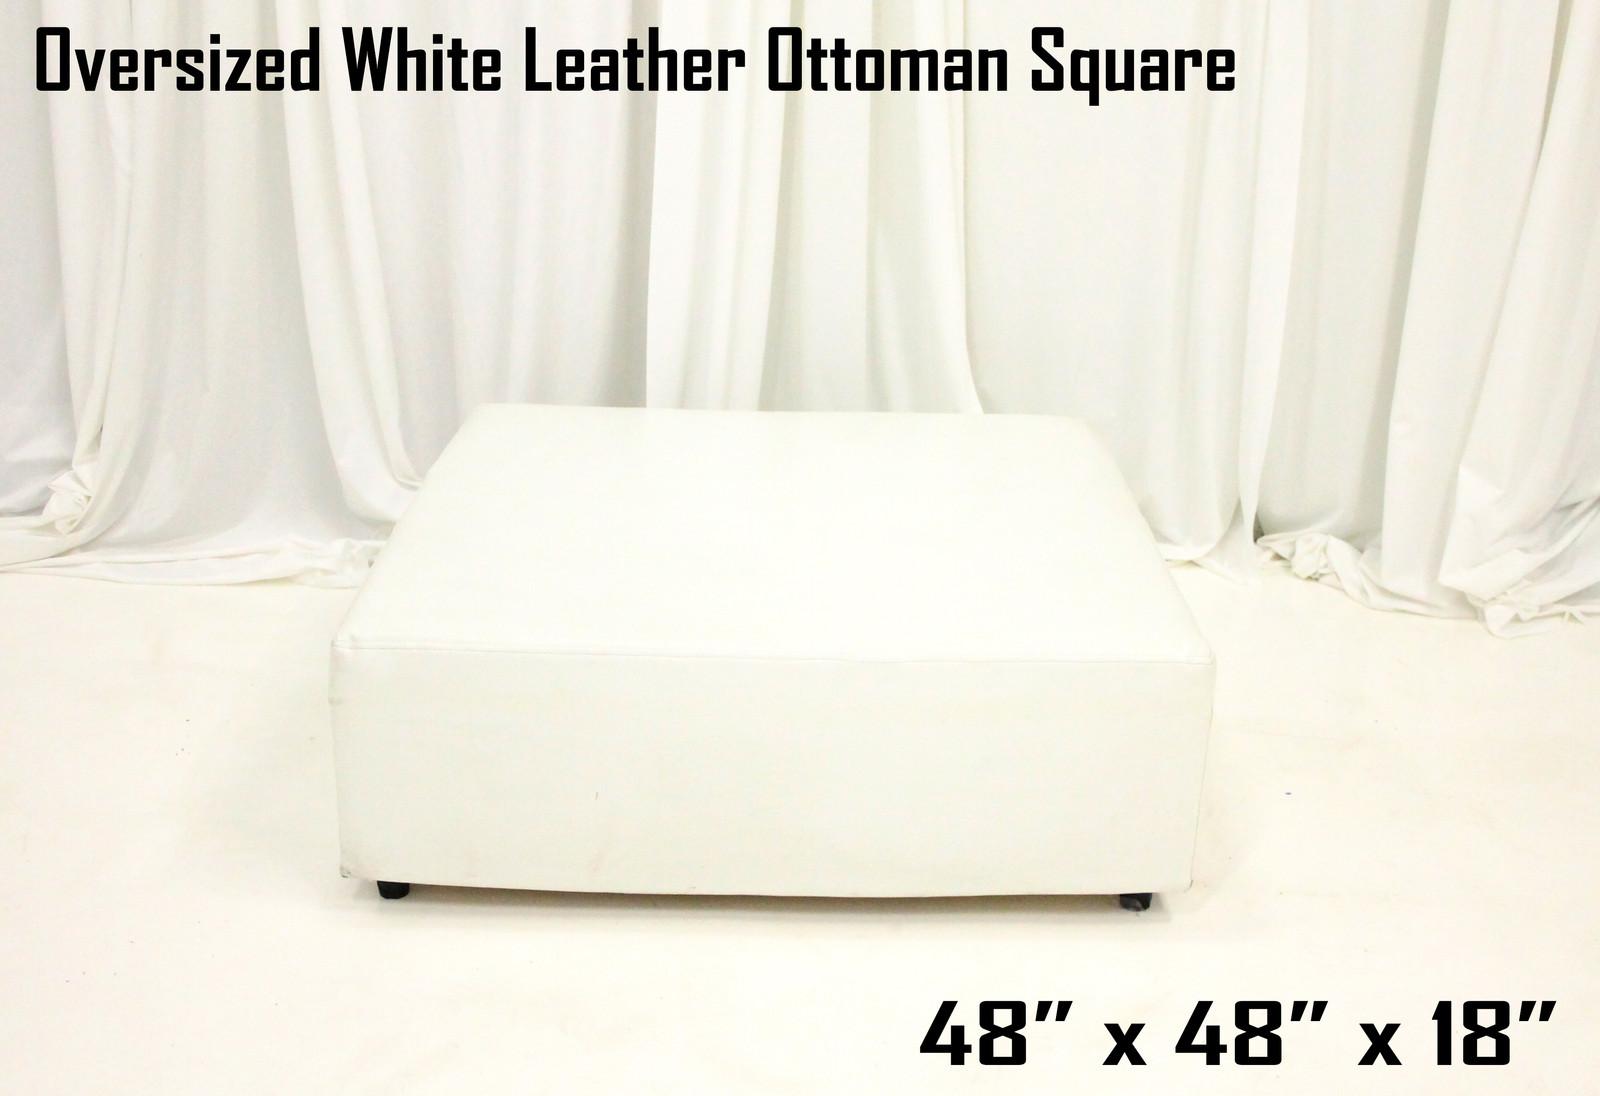 Oversized White Leather Ottoman Square